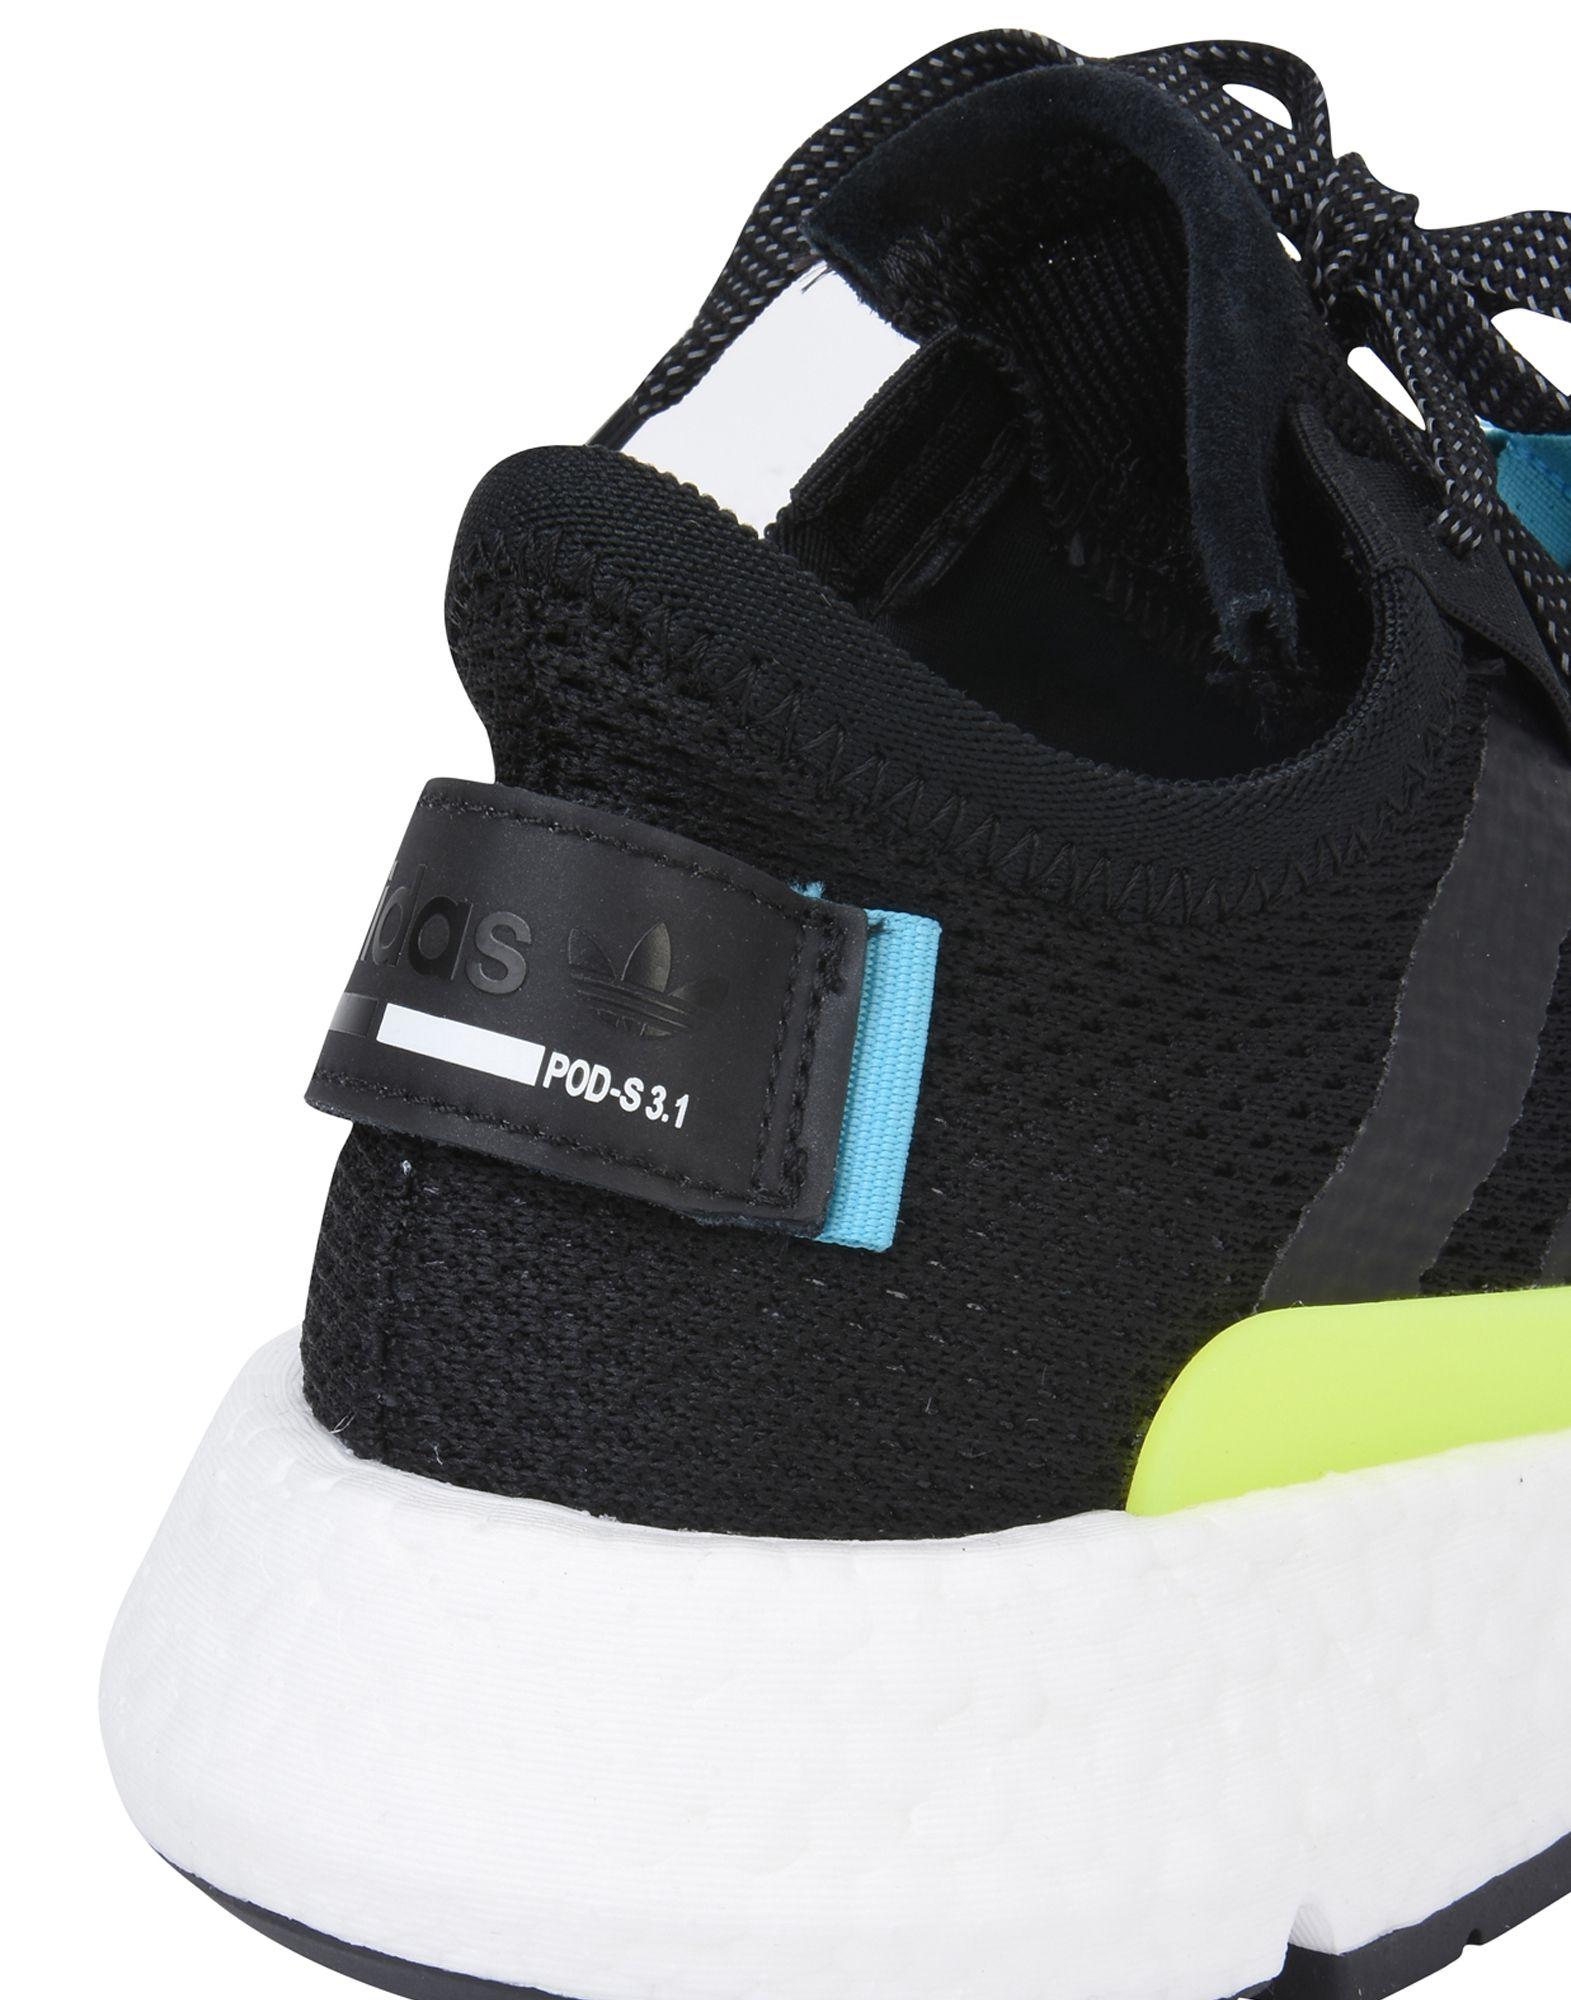 Rabatt 11534634CI echte Schuhe Adidas Originals Pod 11534634CI Rabatt 0a2cd4